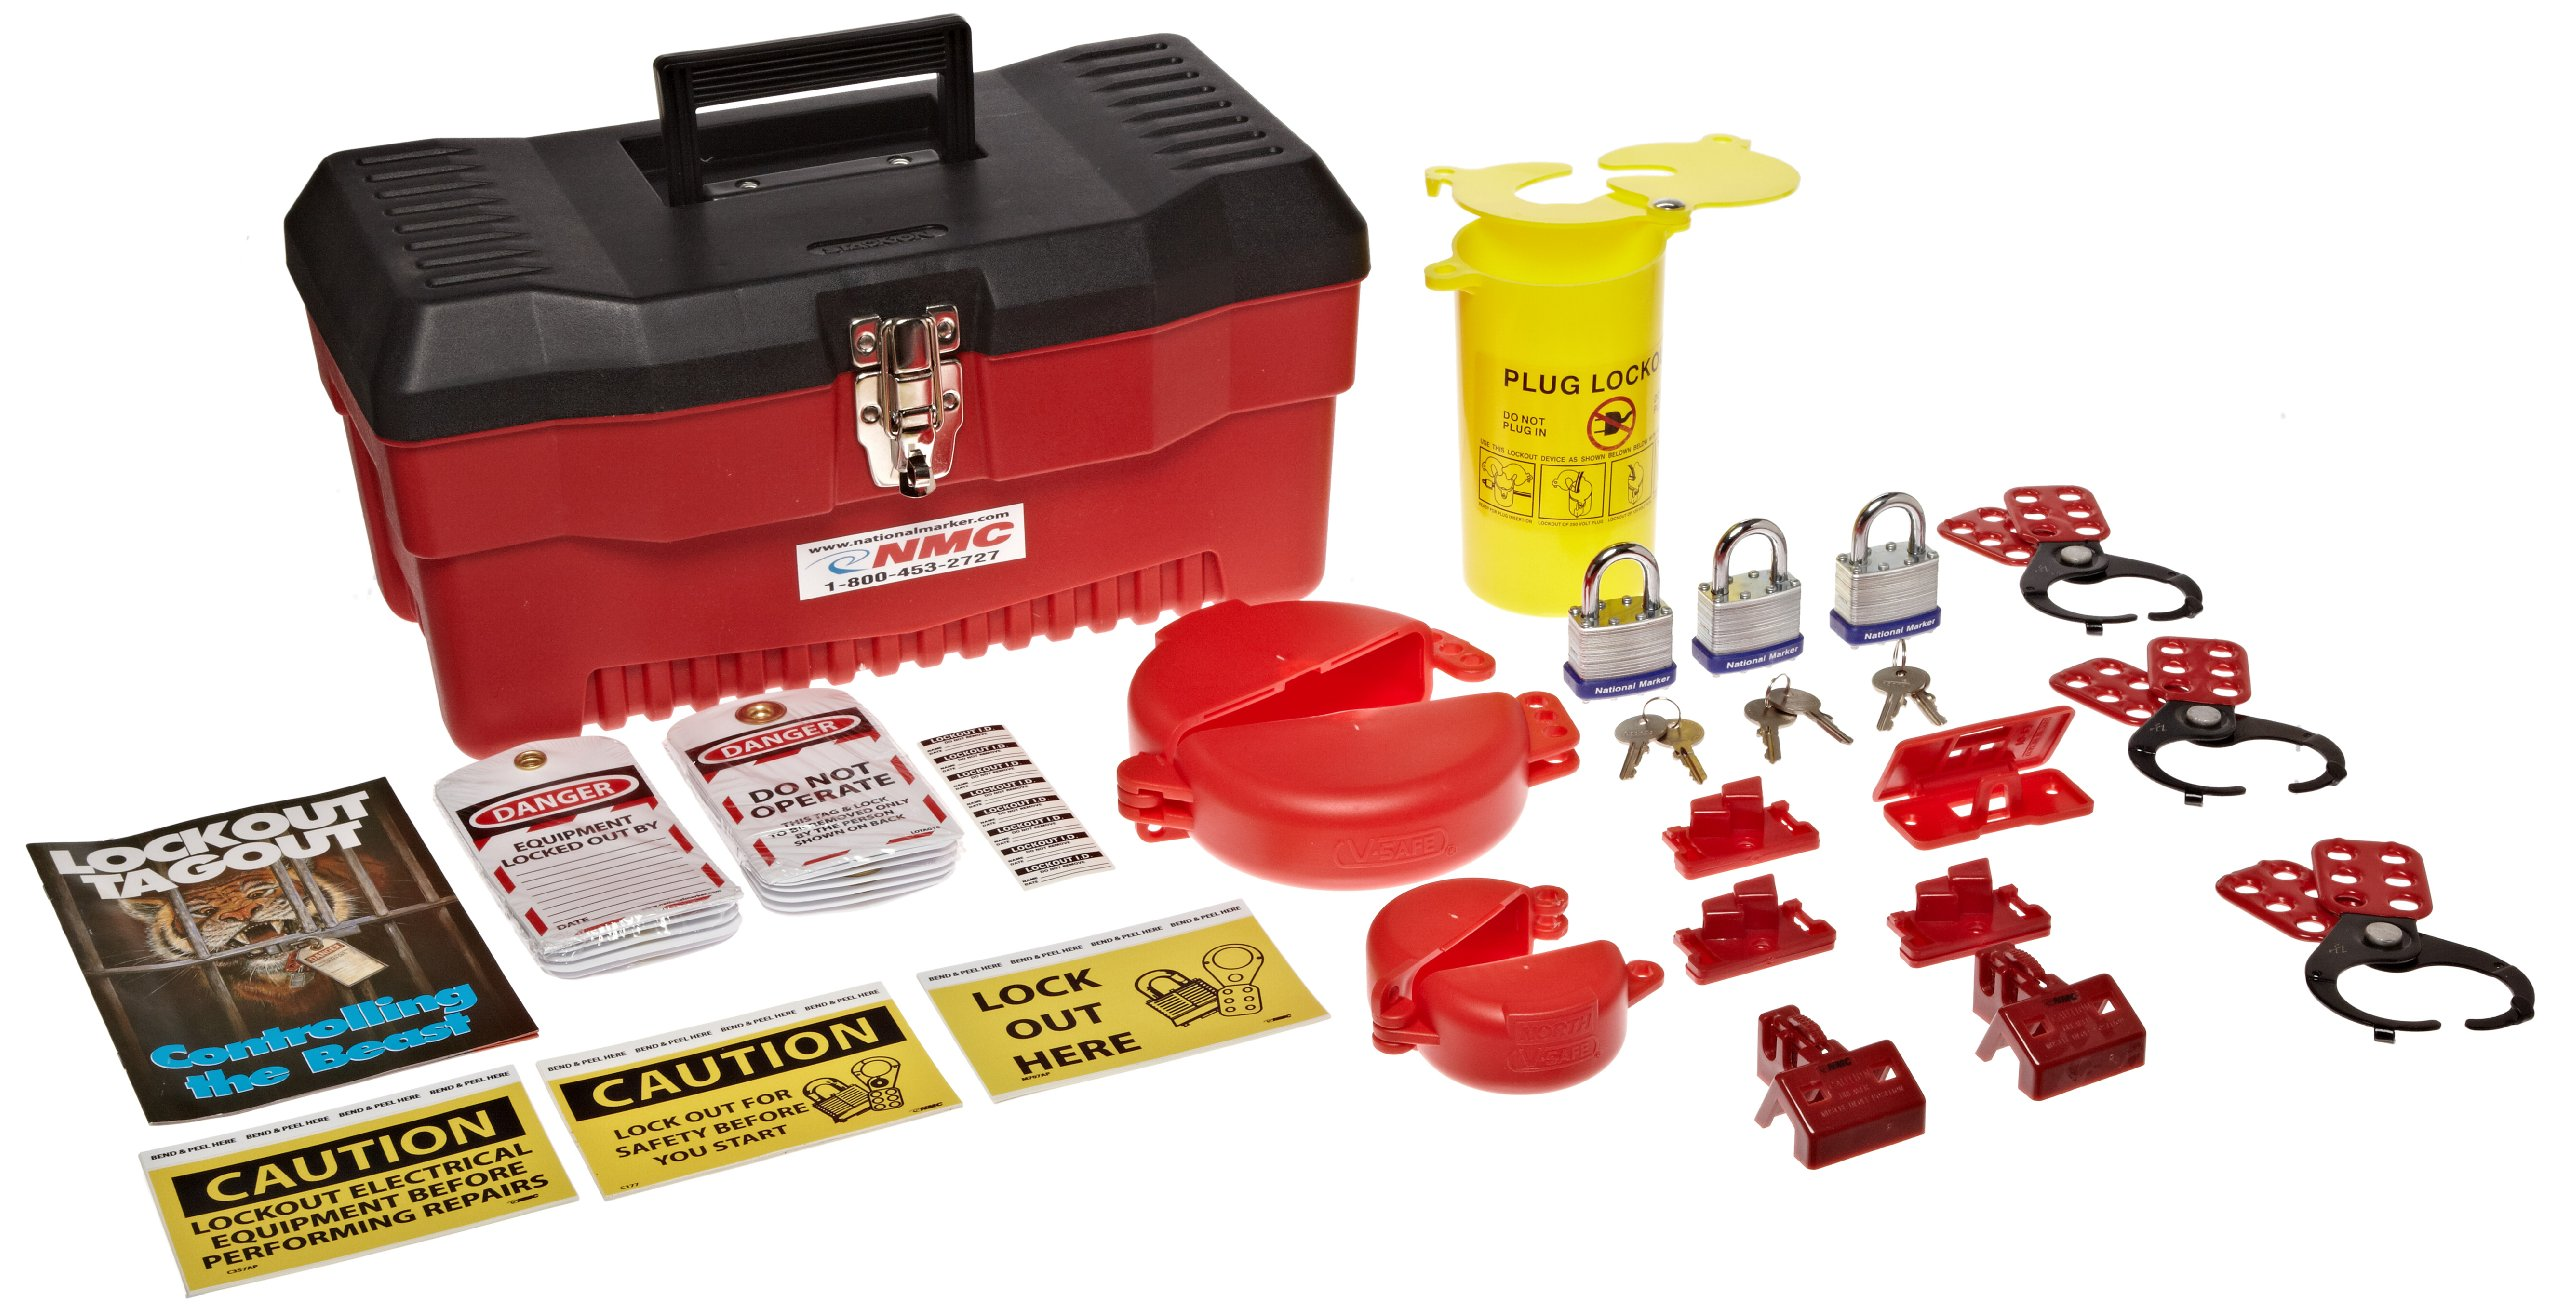 NMC PLOK1 68 Piece Premium Lockout Kit